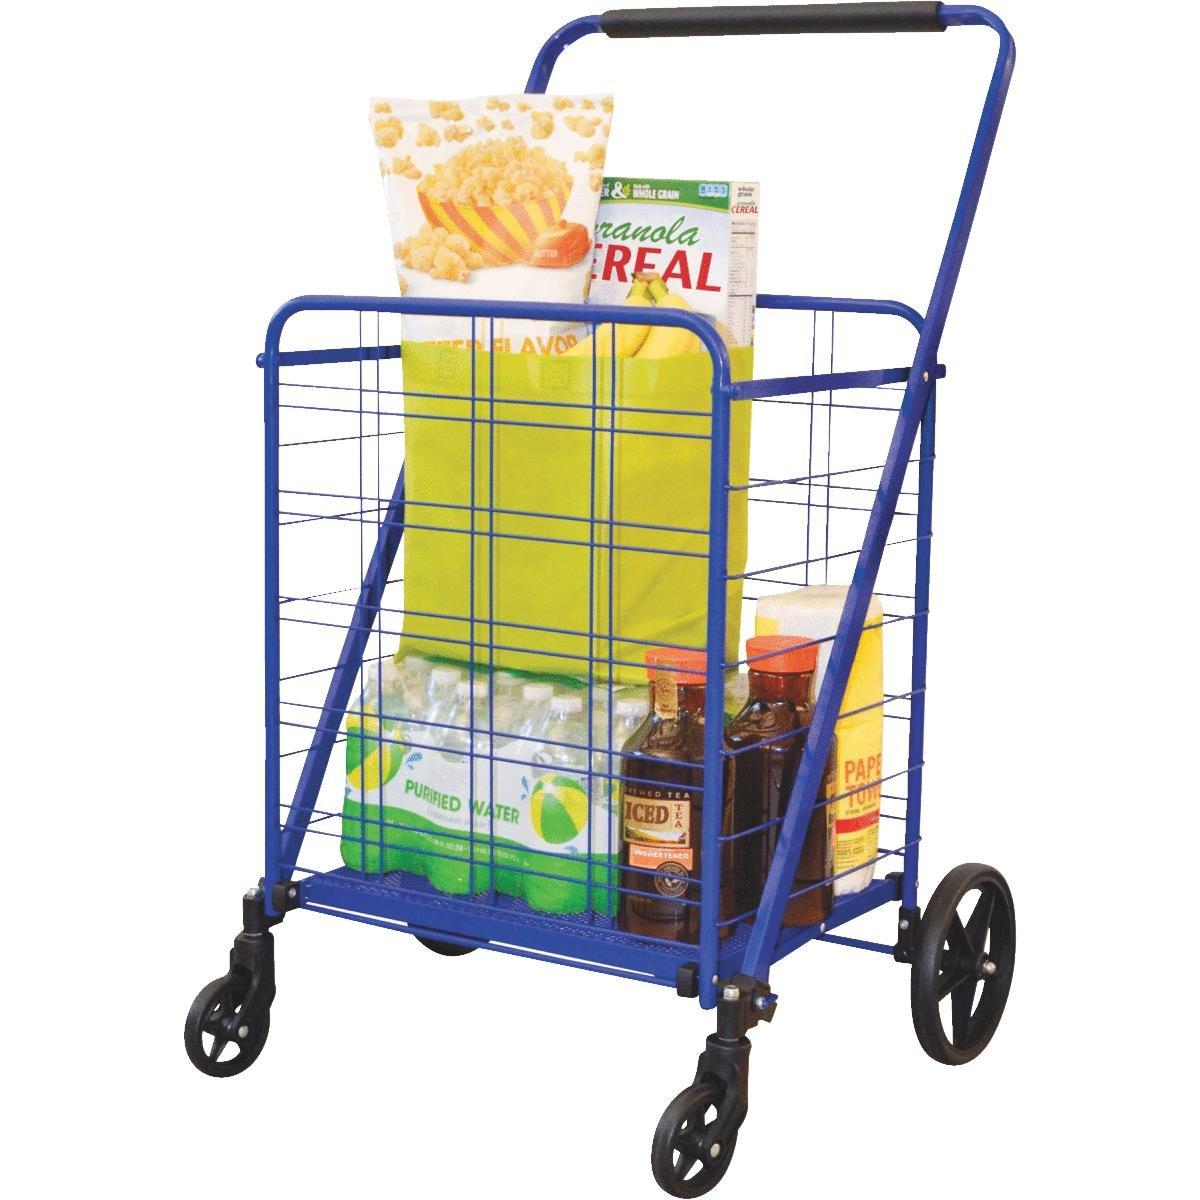 Helping Hand 156329 Shopping Cart Heavy Duty Swivel